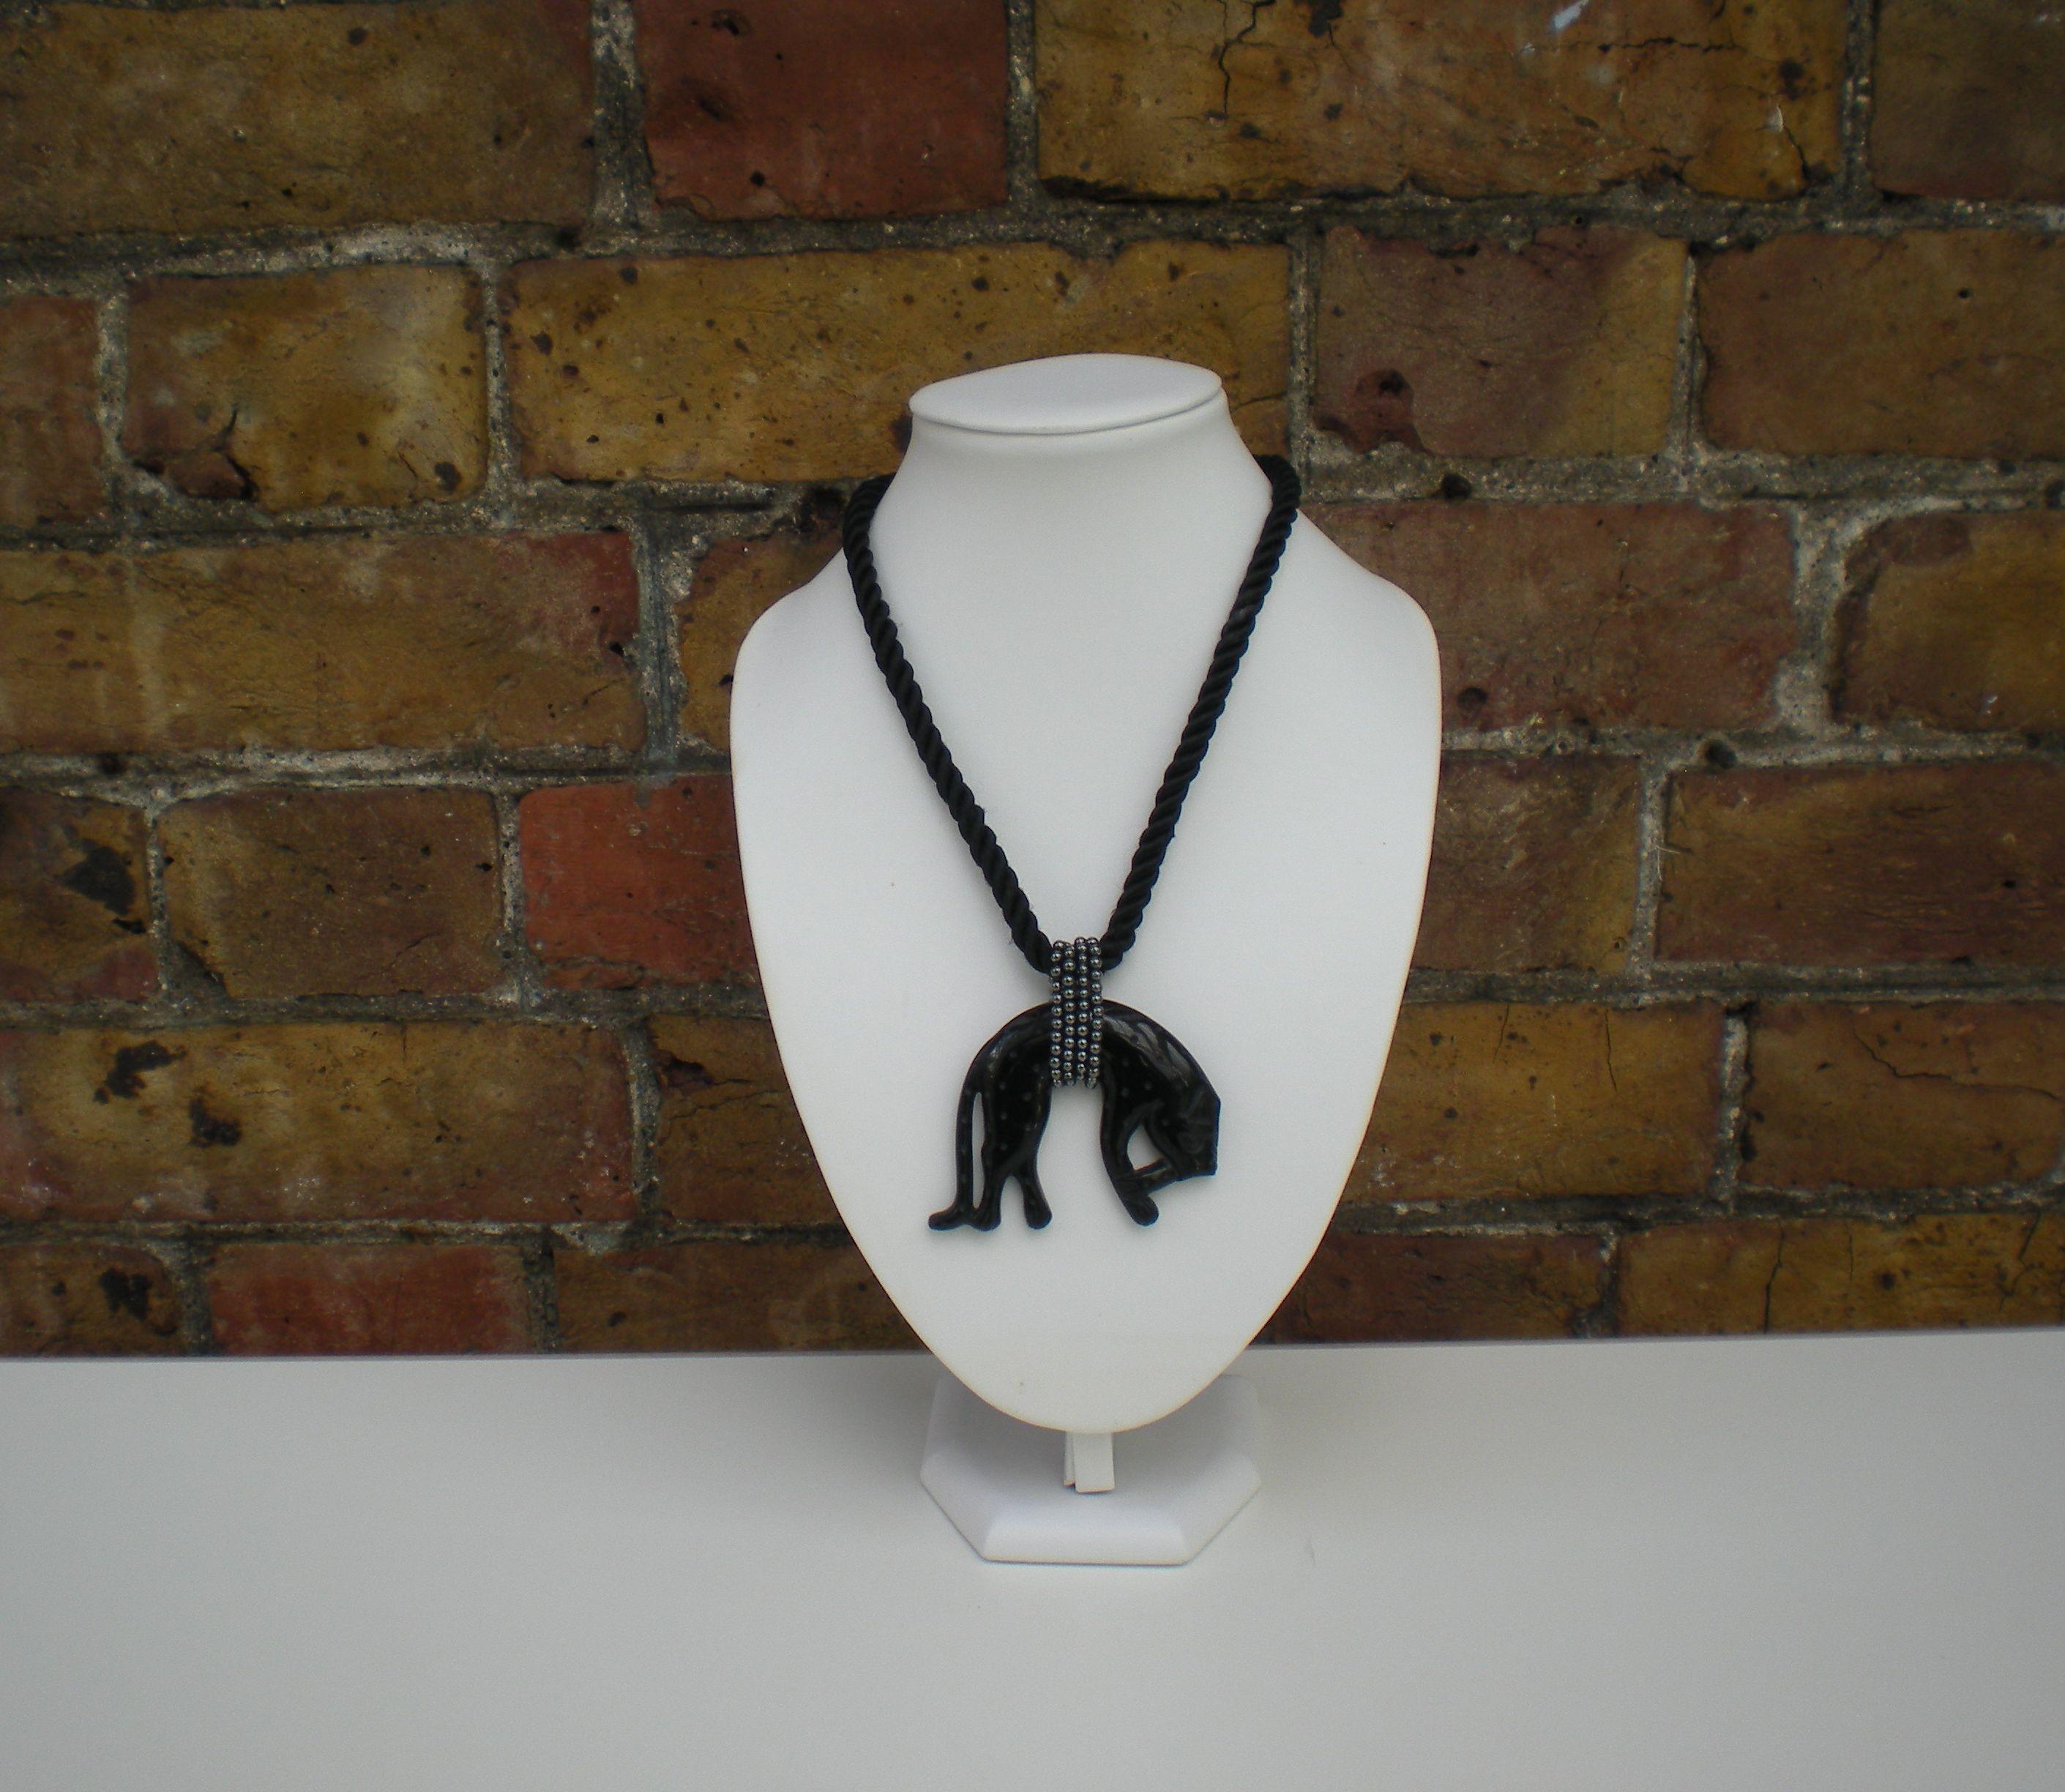 Vintage YSL panther necklace from Lovelyus Vintage Emporium